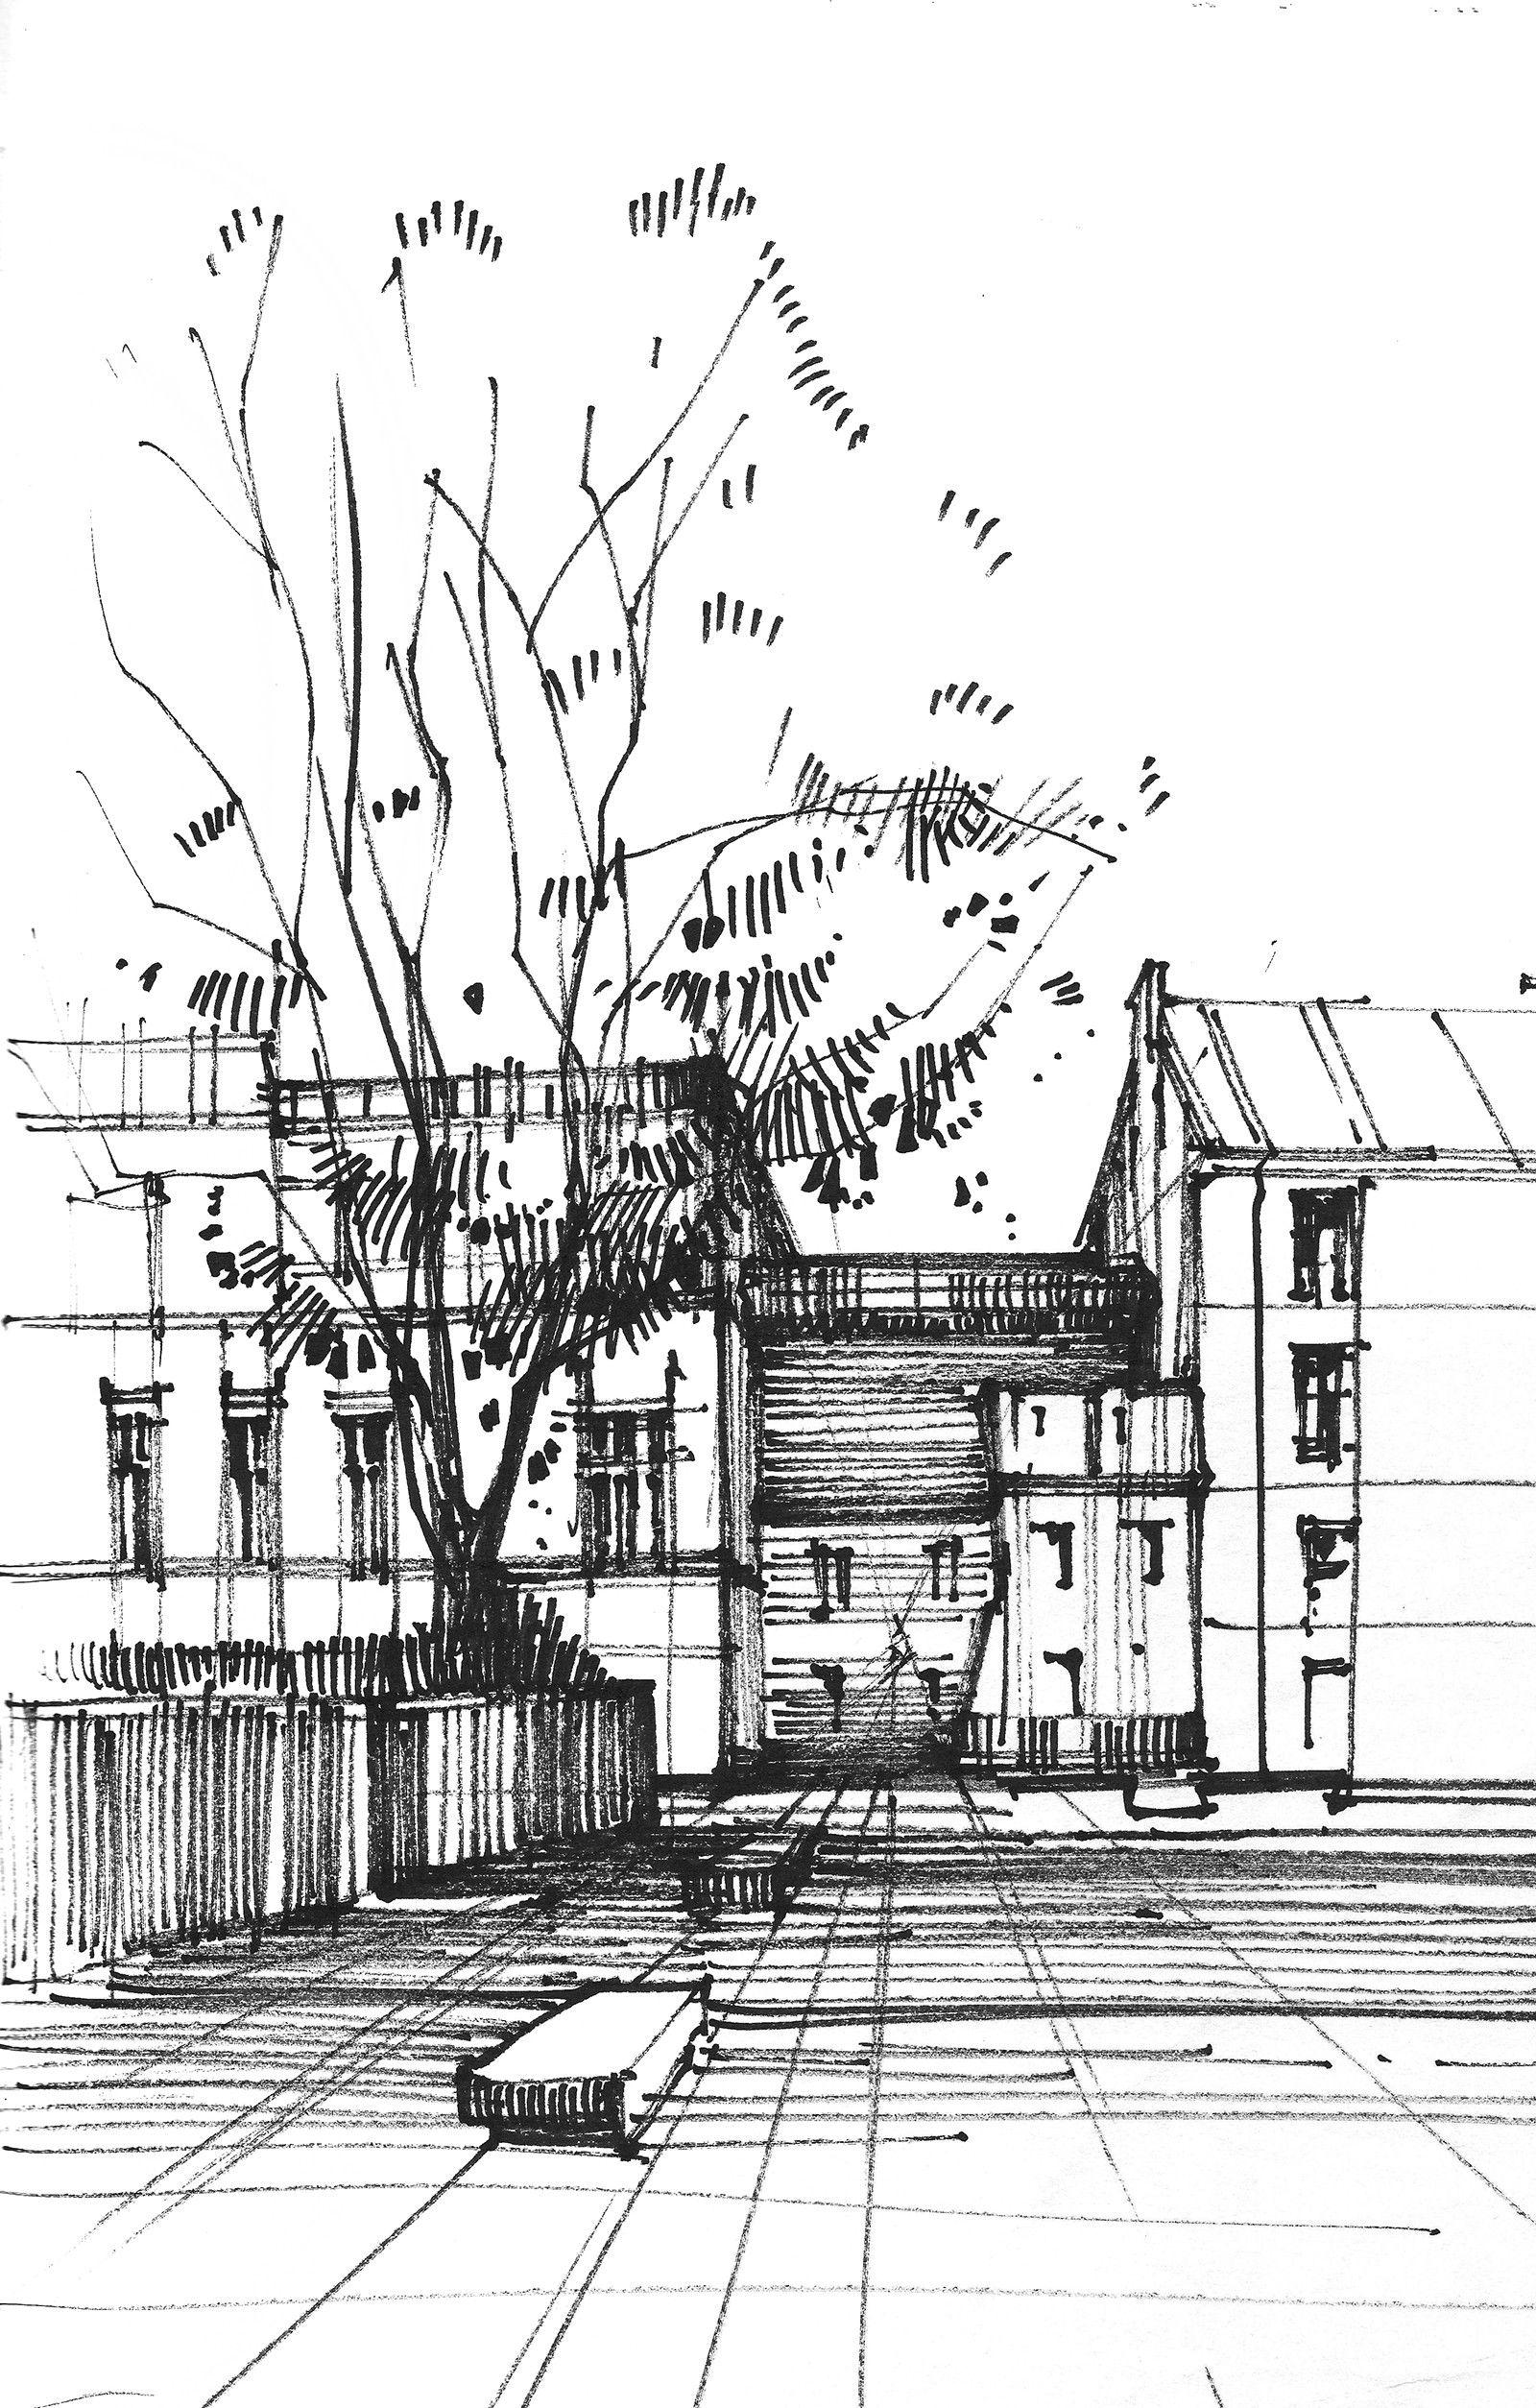 Architecture sketches, Barbara Gołębiewska | Architecture sketch,  Architecture drawing, Sketches